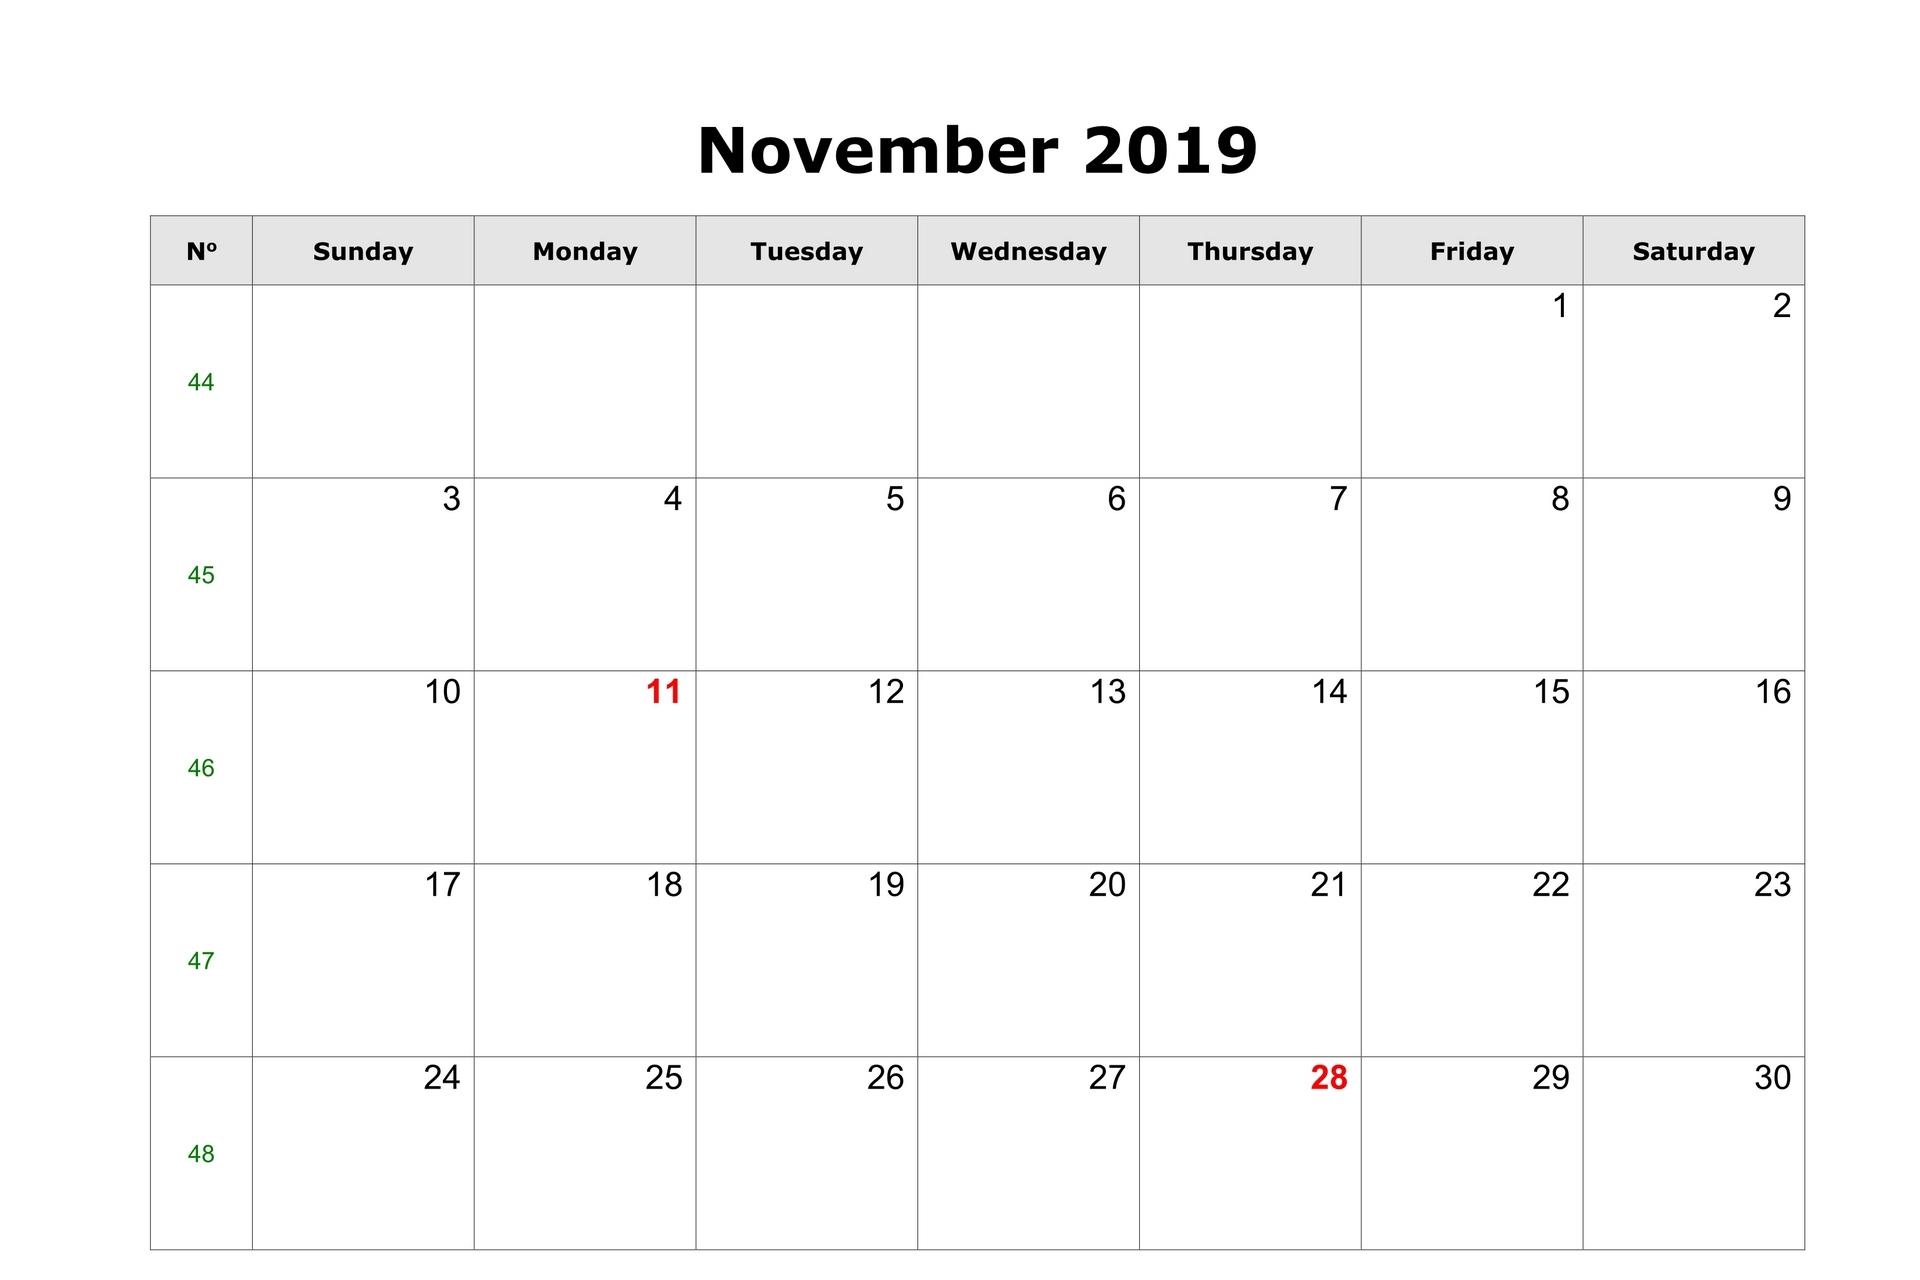 Blank Editable Calendar for November 2019